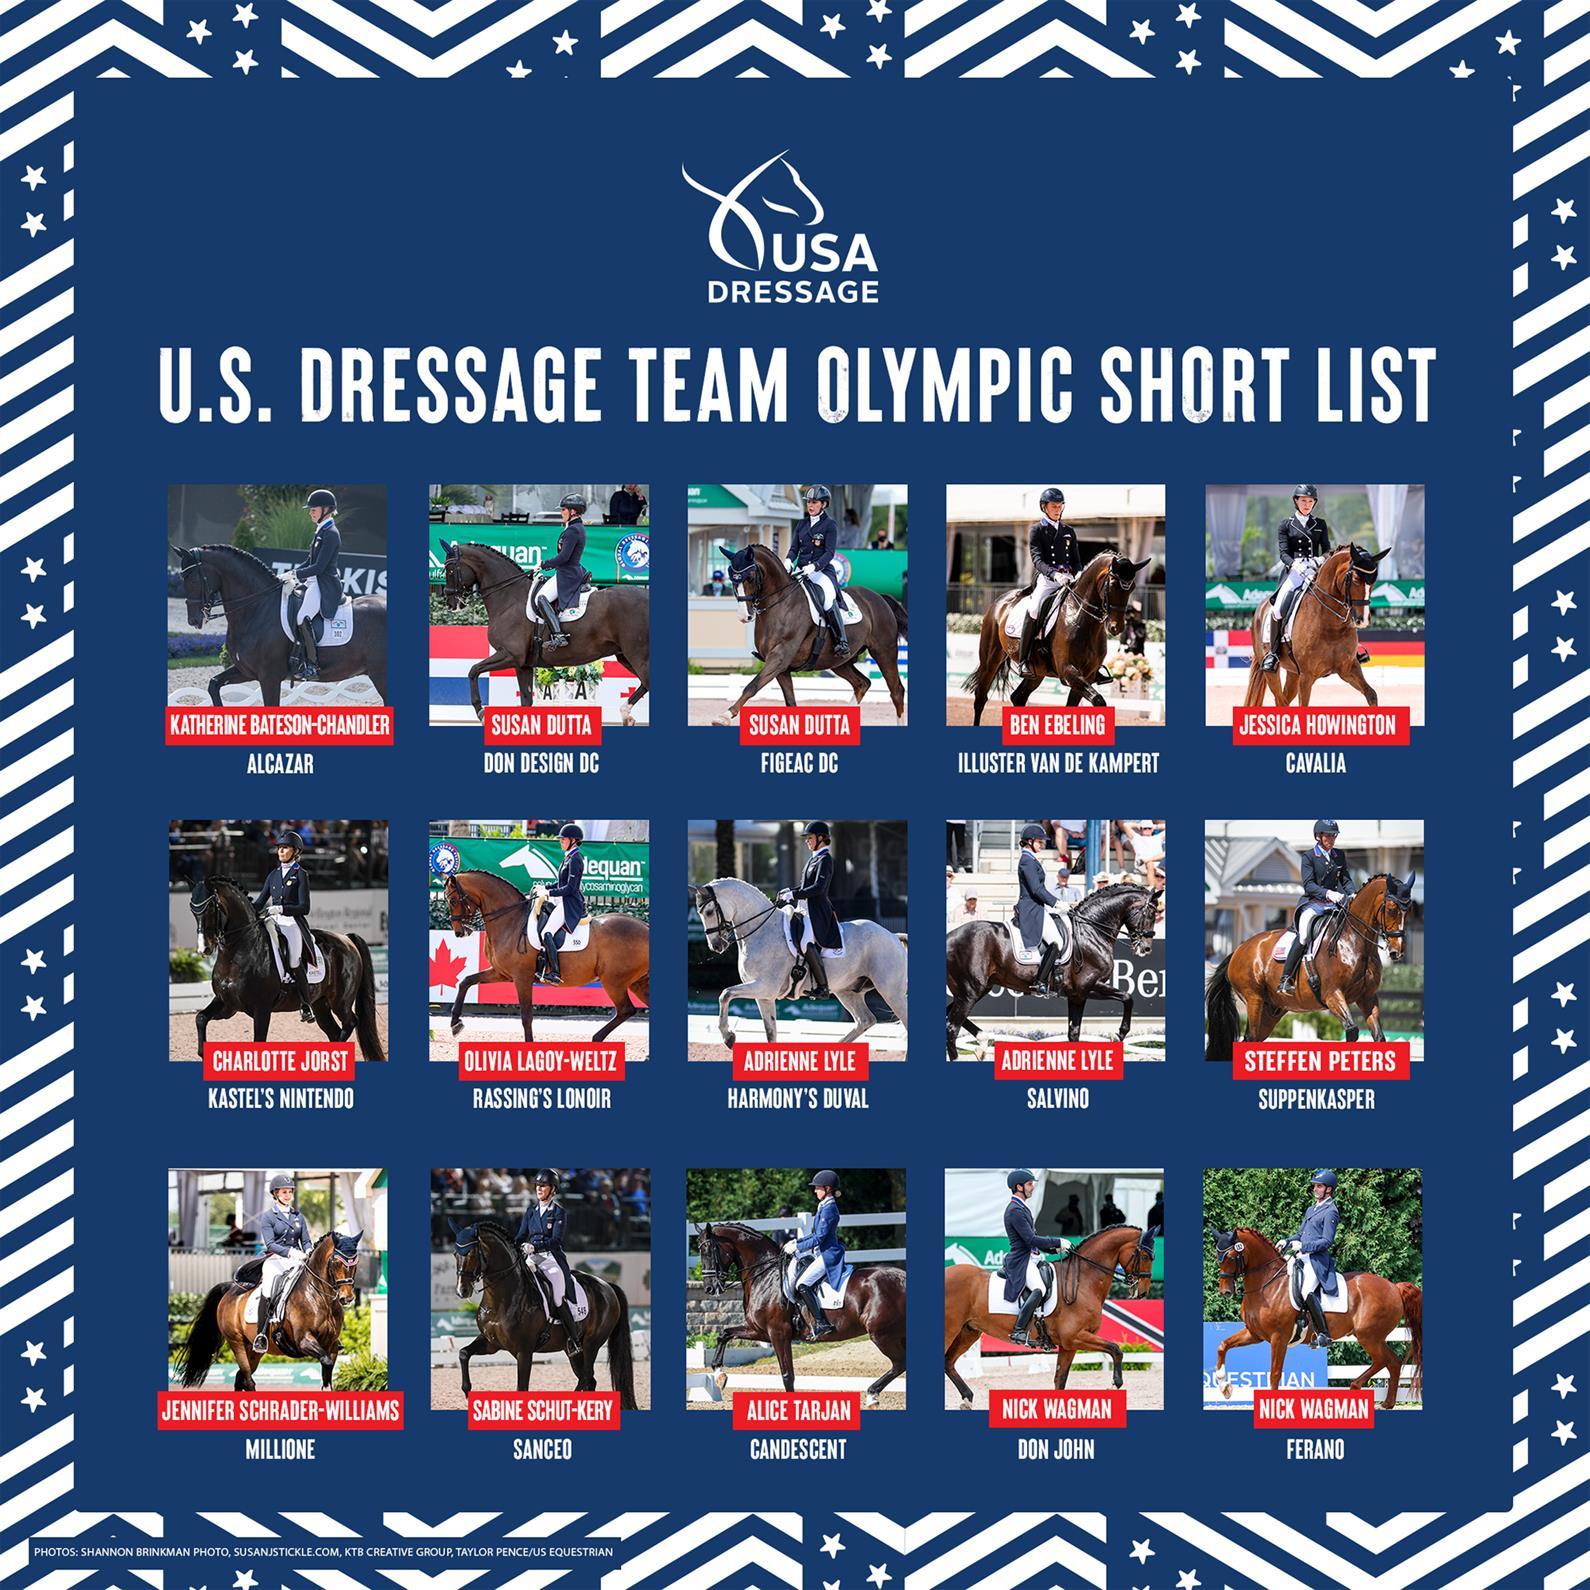 US Dressage Team Short List for the 2020 Tokyo Olympics